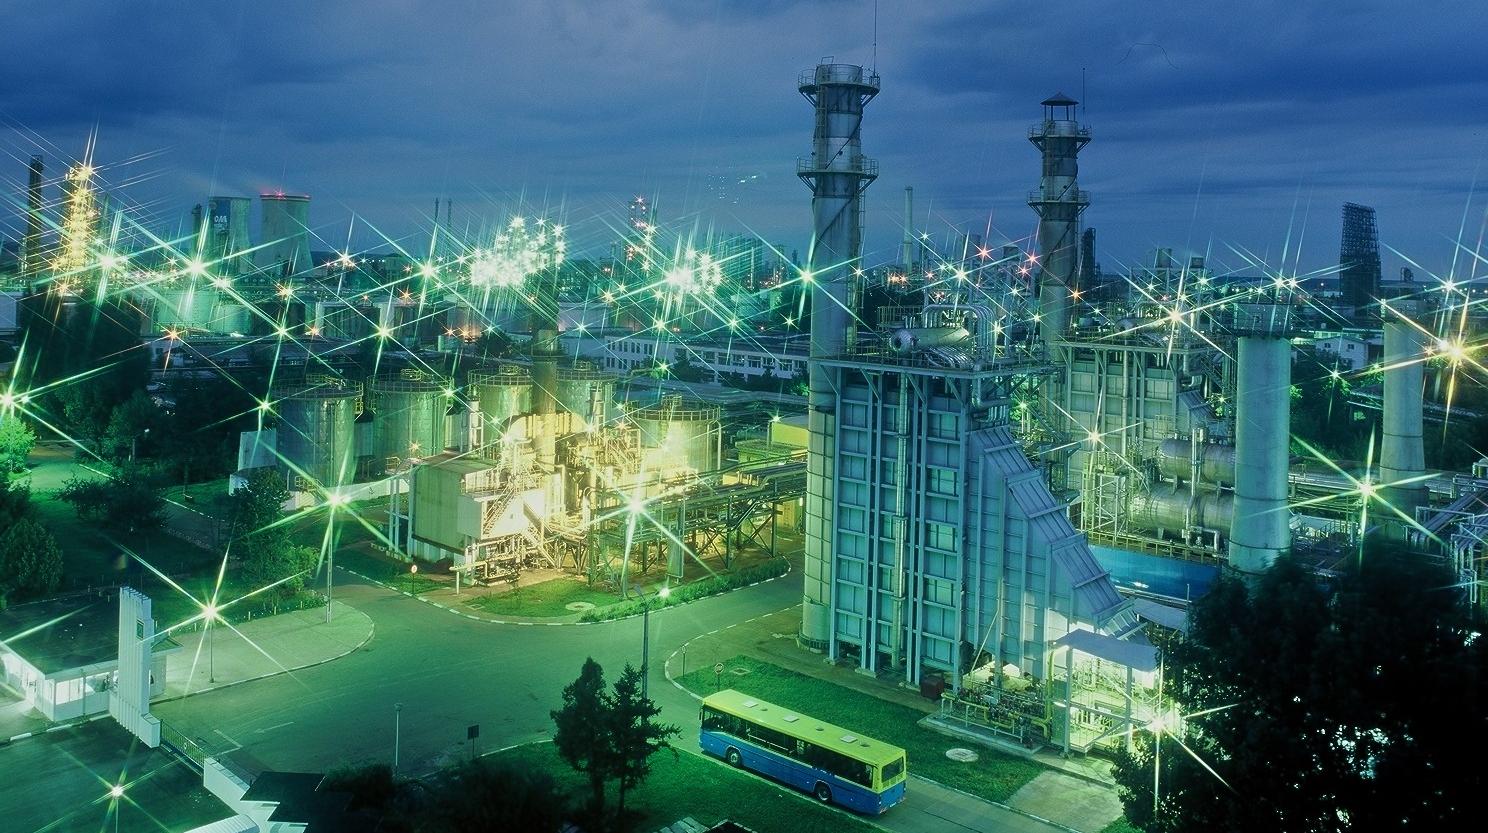 Petrobrazi Refinery Ploiesti